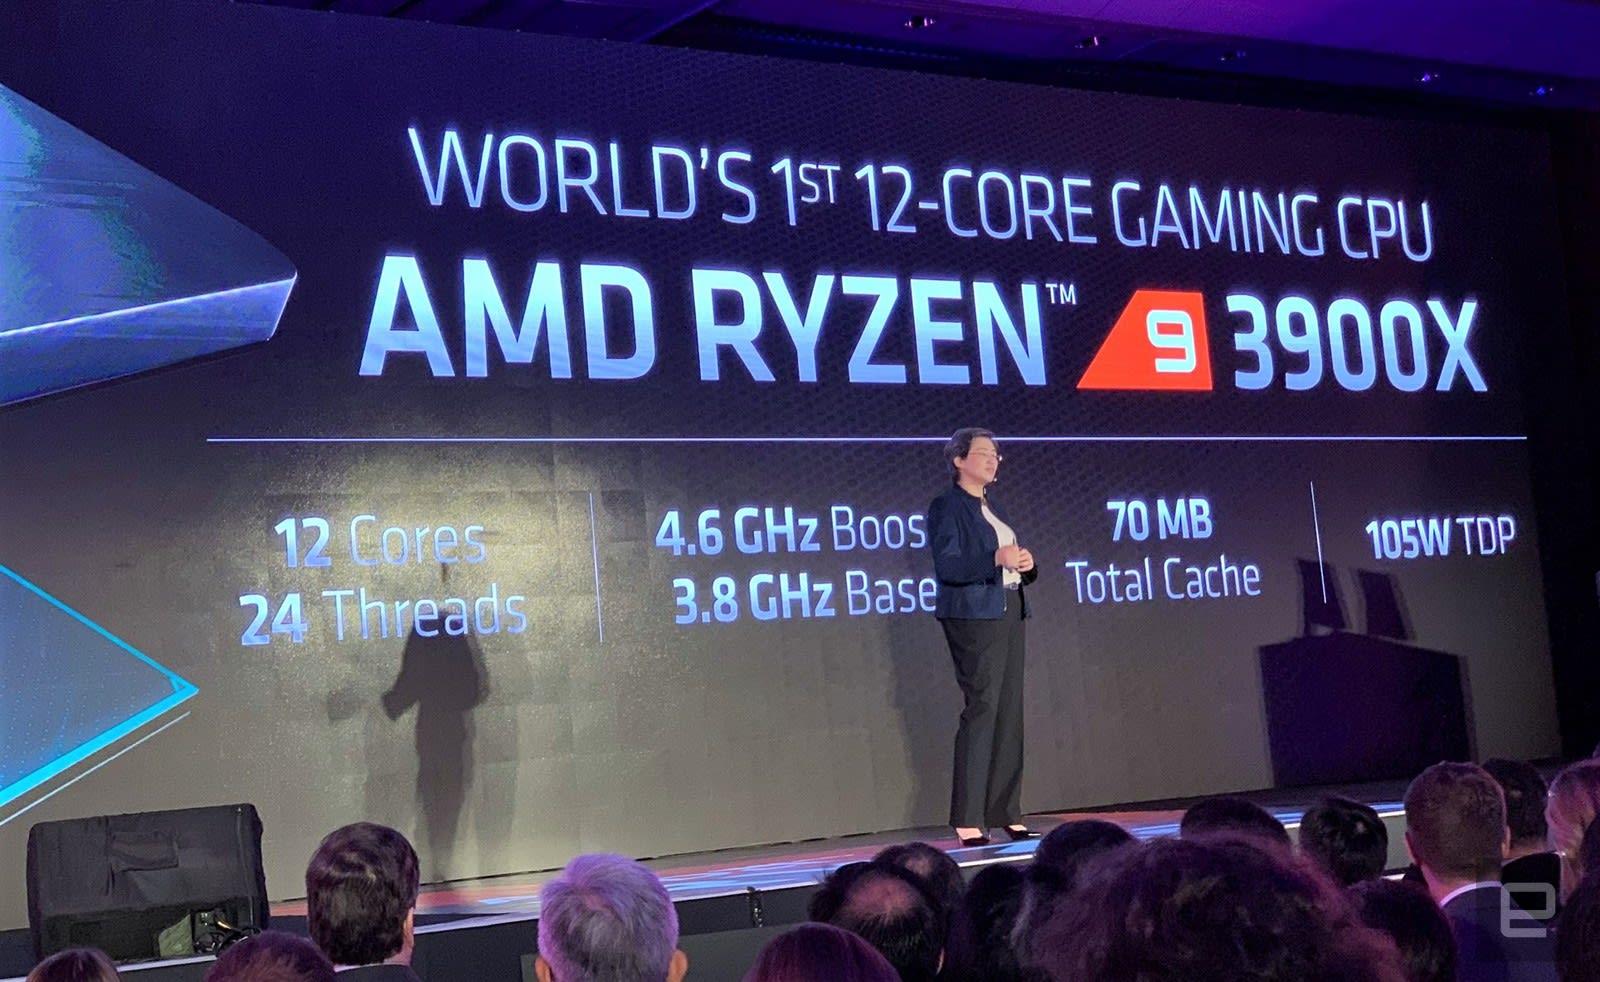 AMD Ryzen 3900X